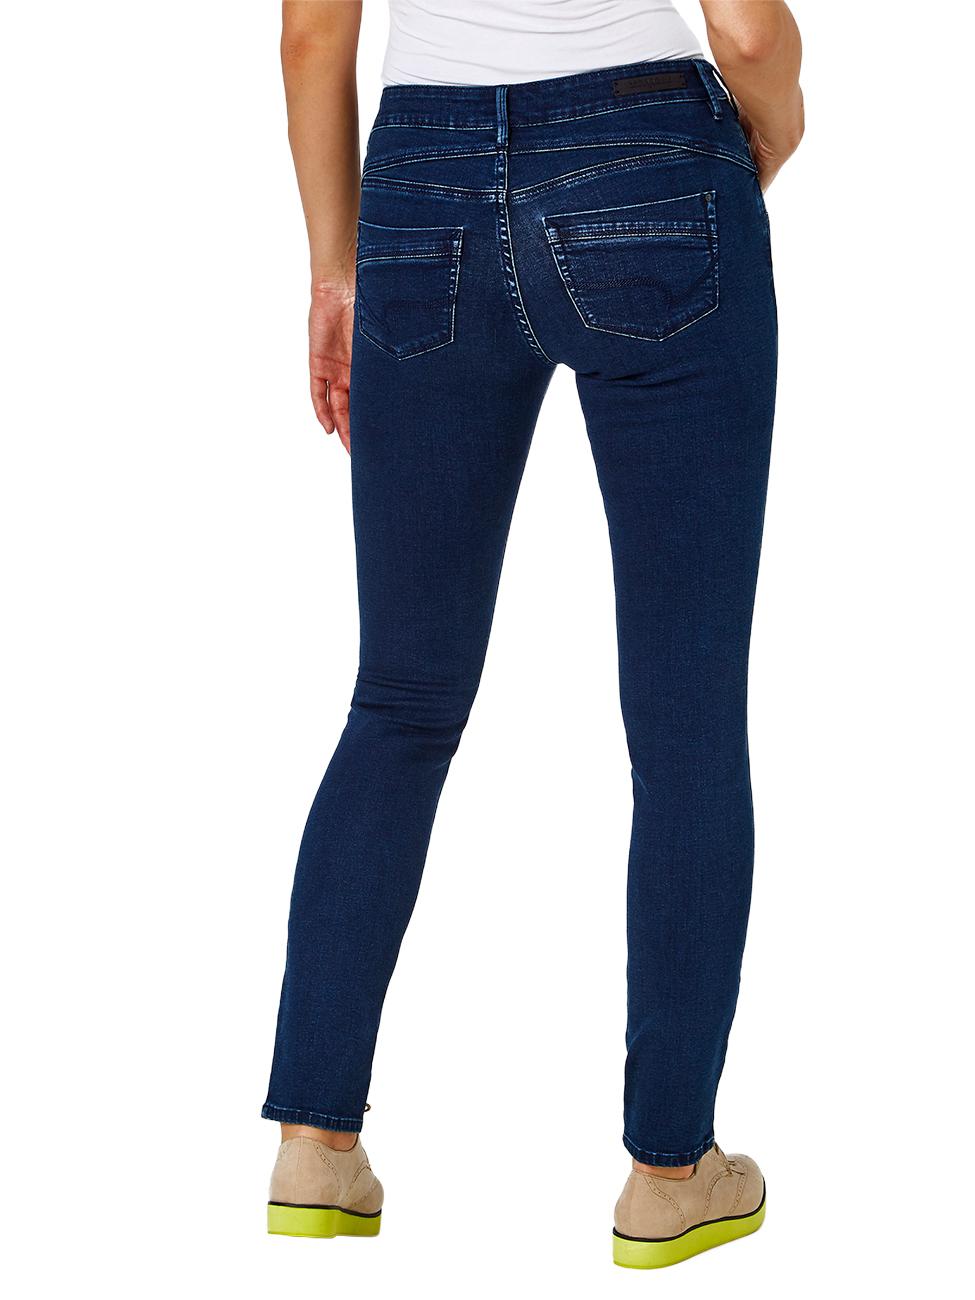 paddock-s-damen-jeans-lucy-slim-fit-blau-blue-dark-stone